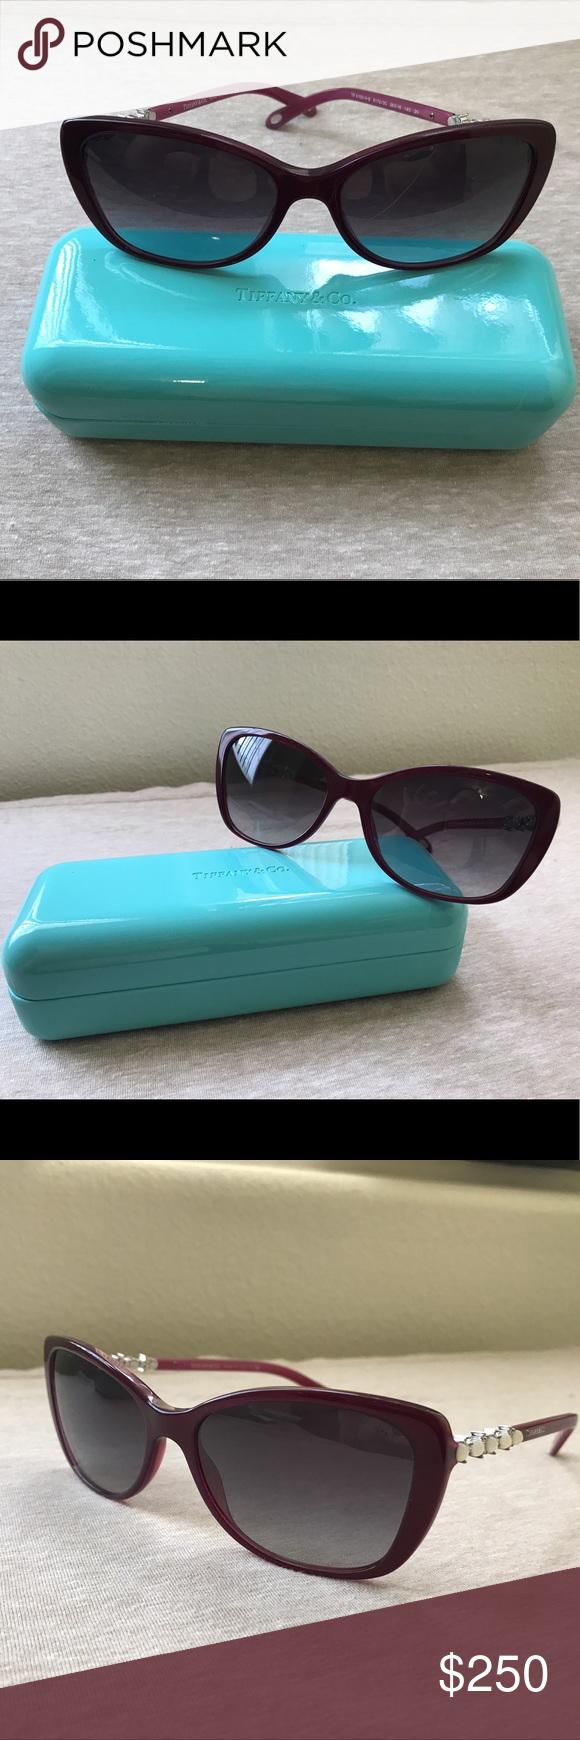 Tiffany and Co Ladies Sunglasses | My Posh Picks | Pinterest